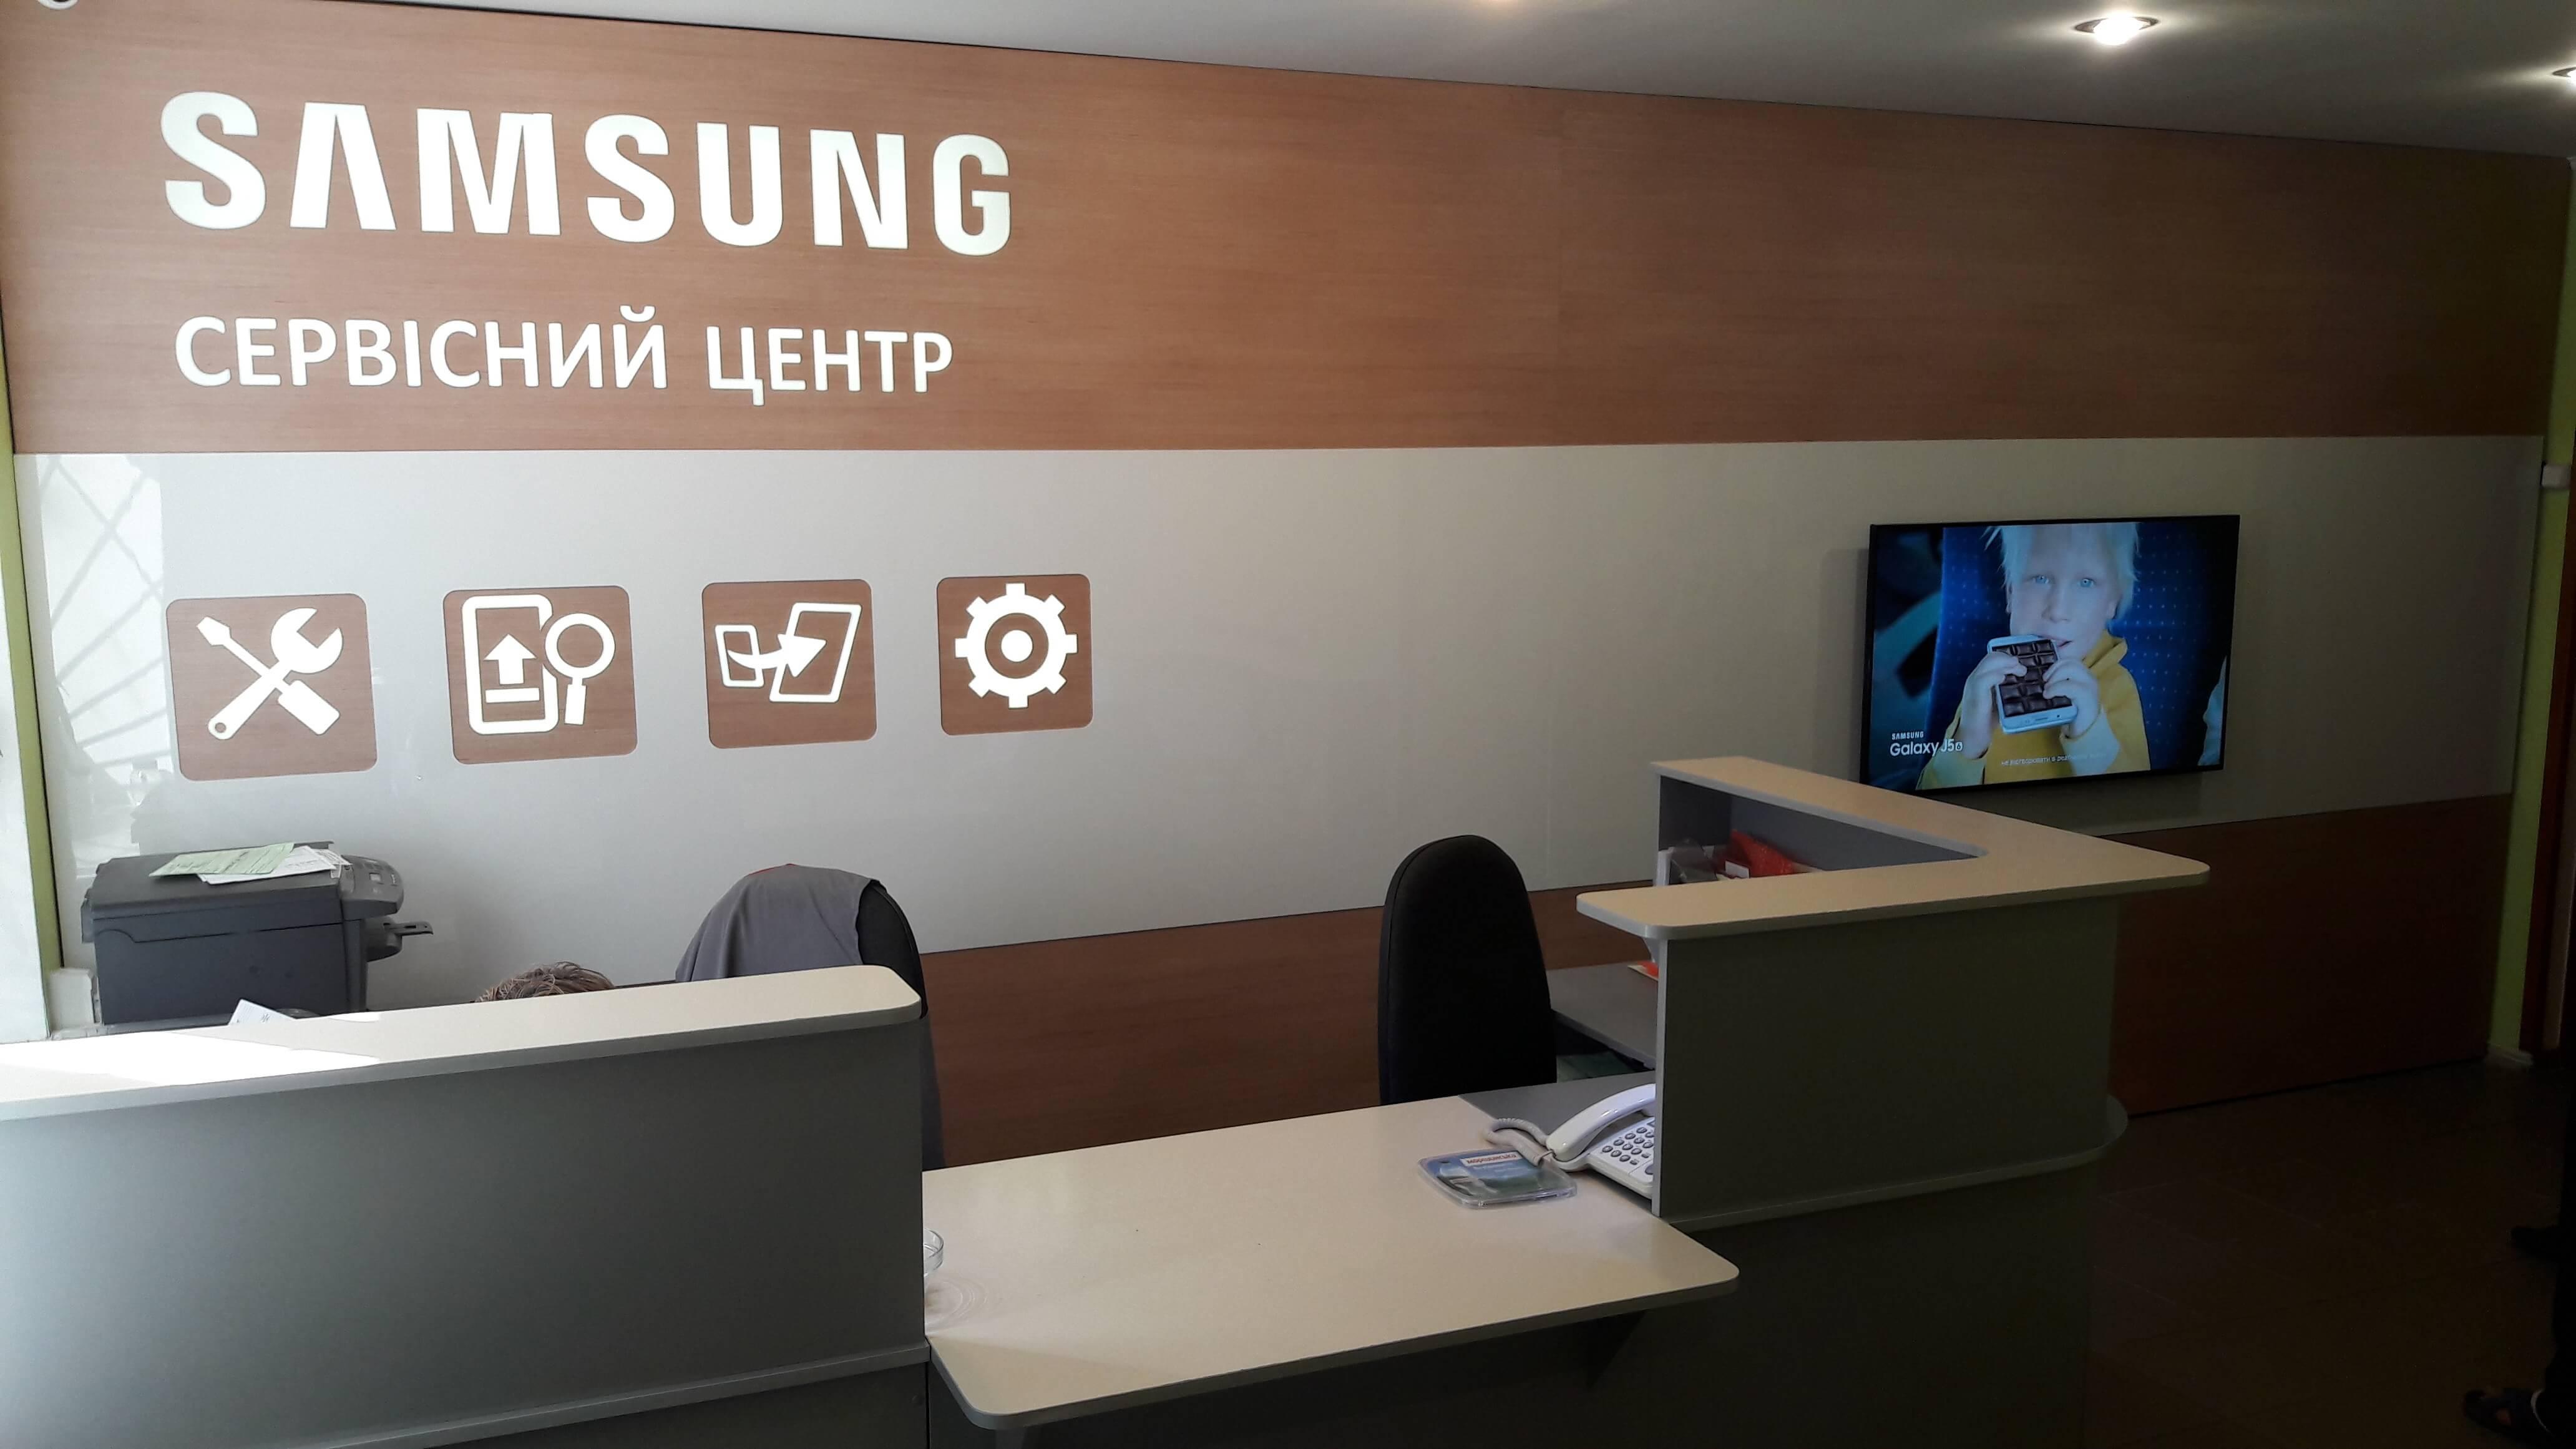 Сервисный центр Samsung